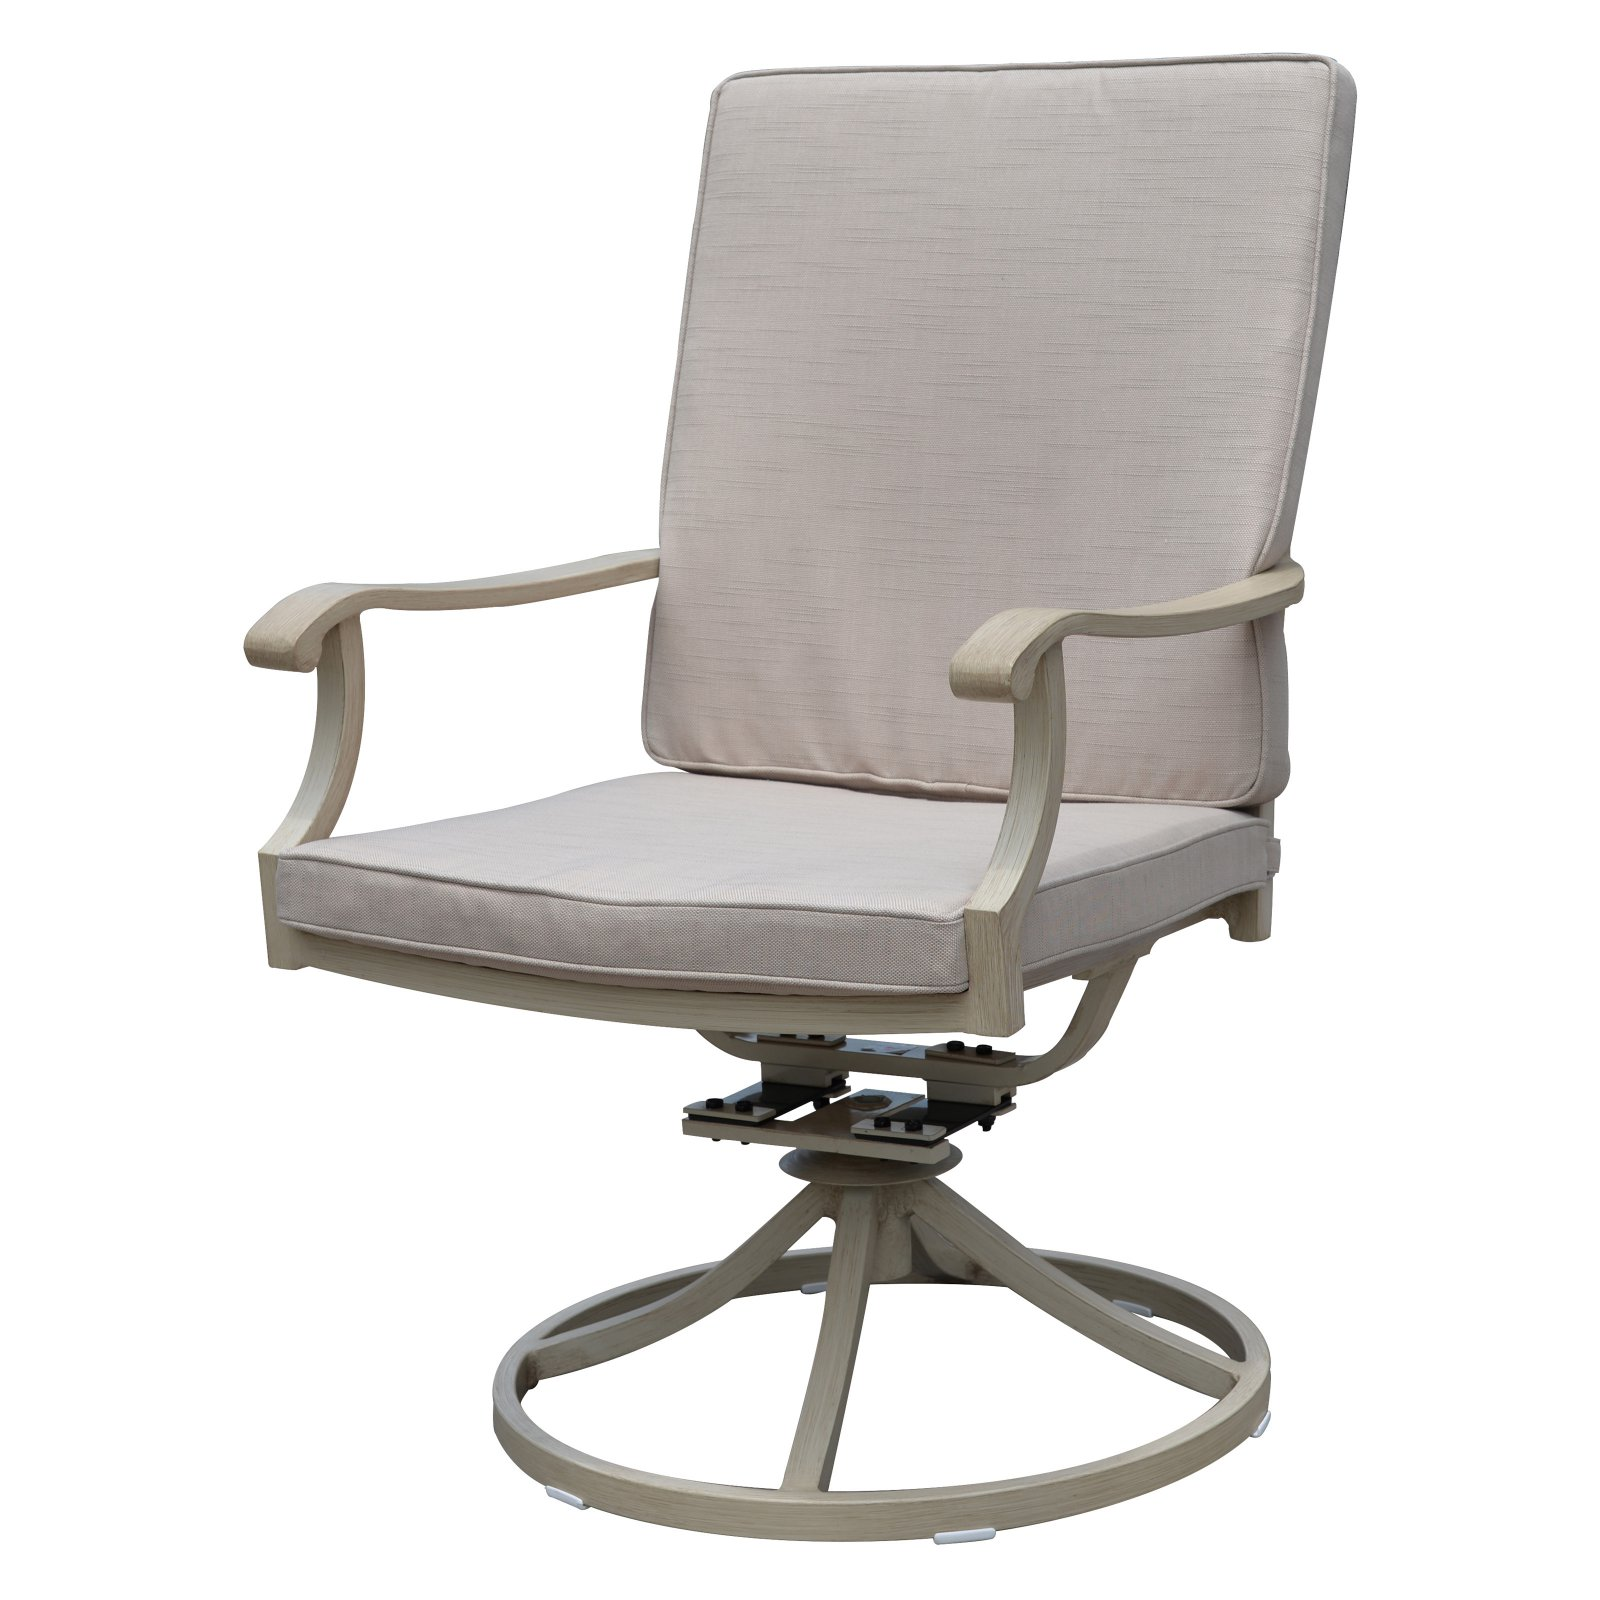 Camel Torino Aluminum Outdoor Swivel Dining Chairs, Set of 2